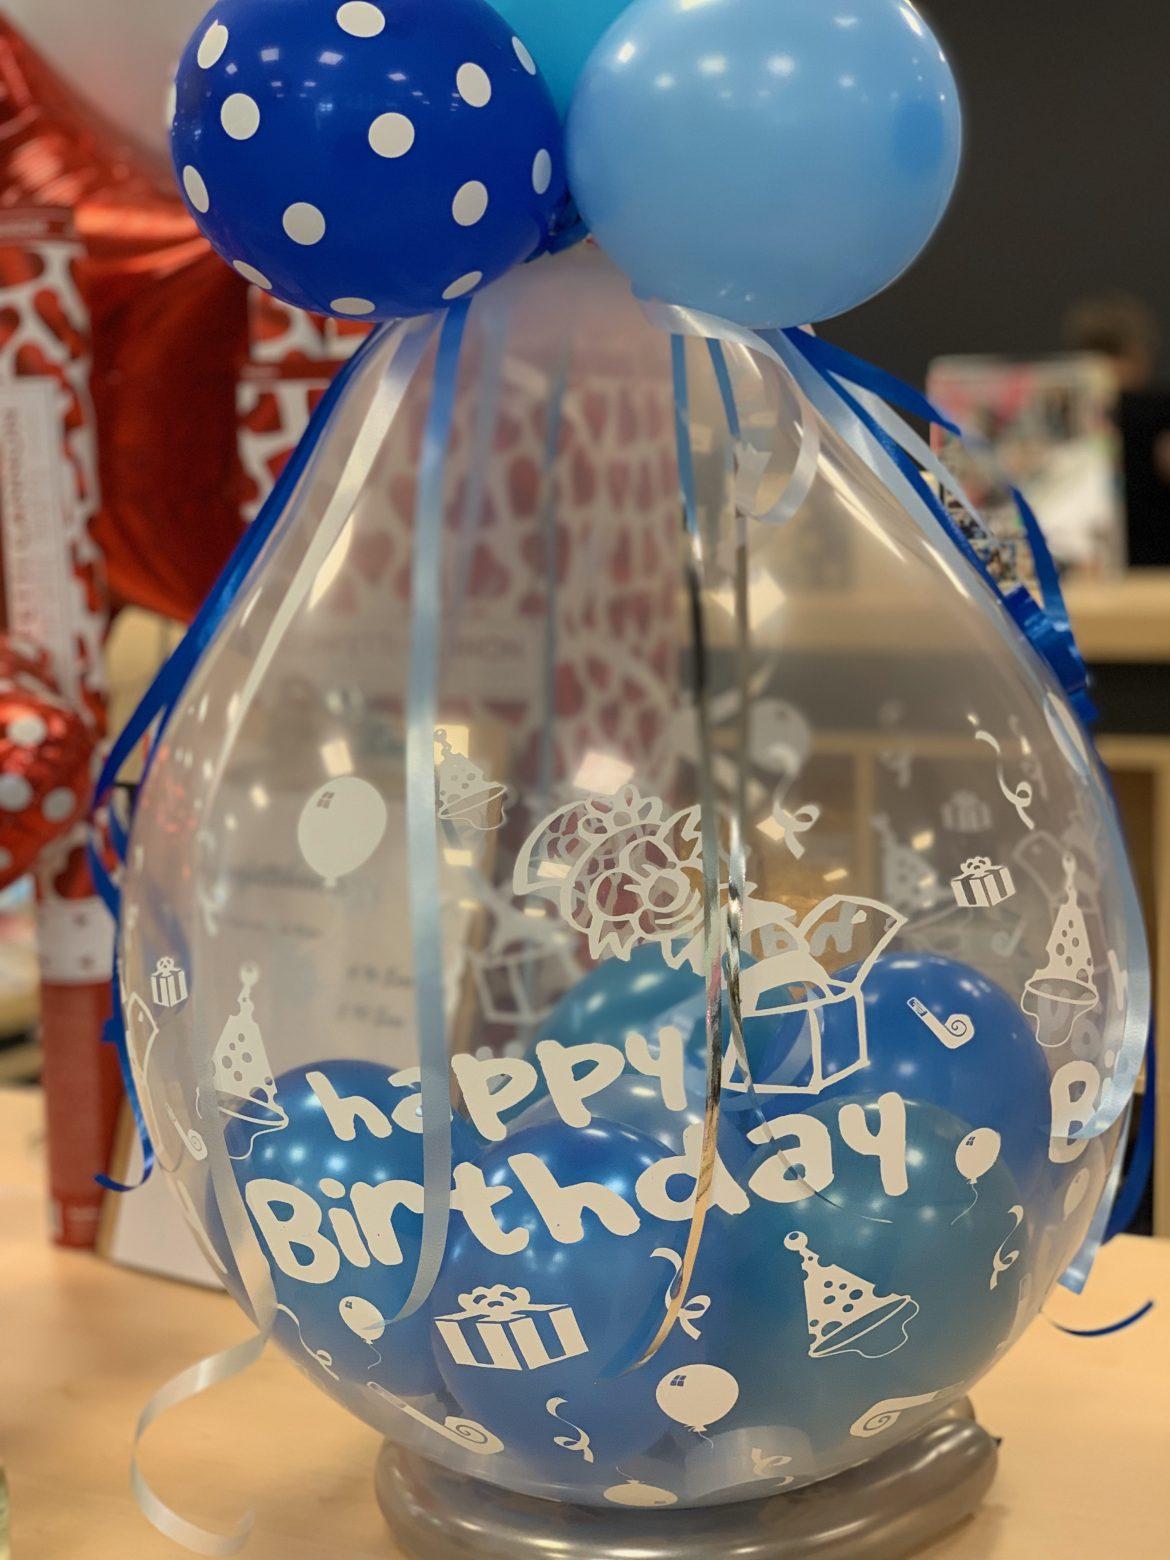 gefüllter Ballon